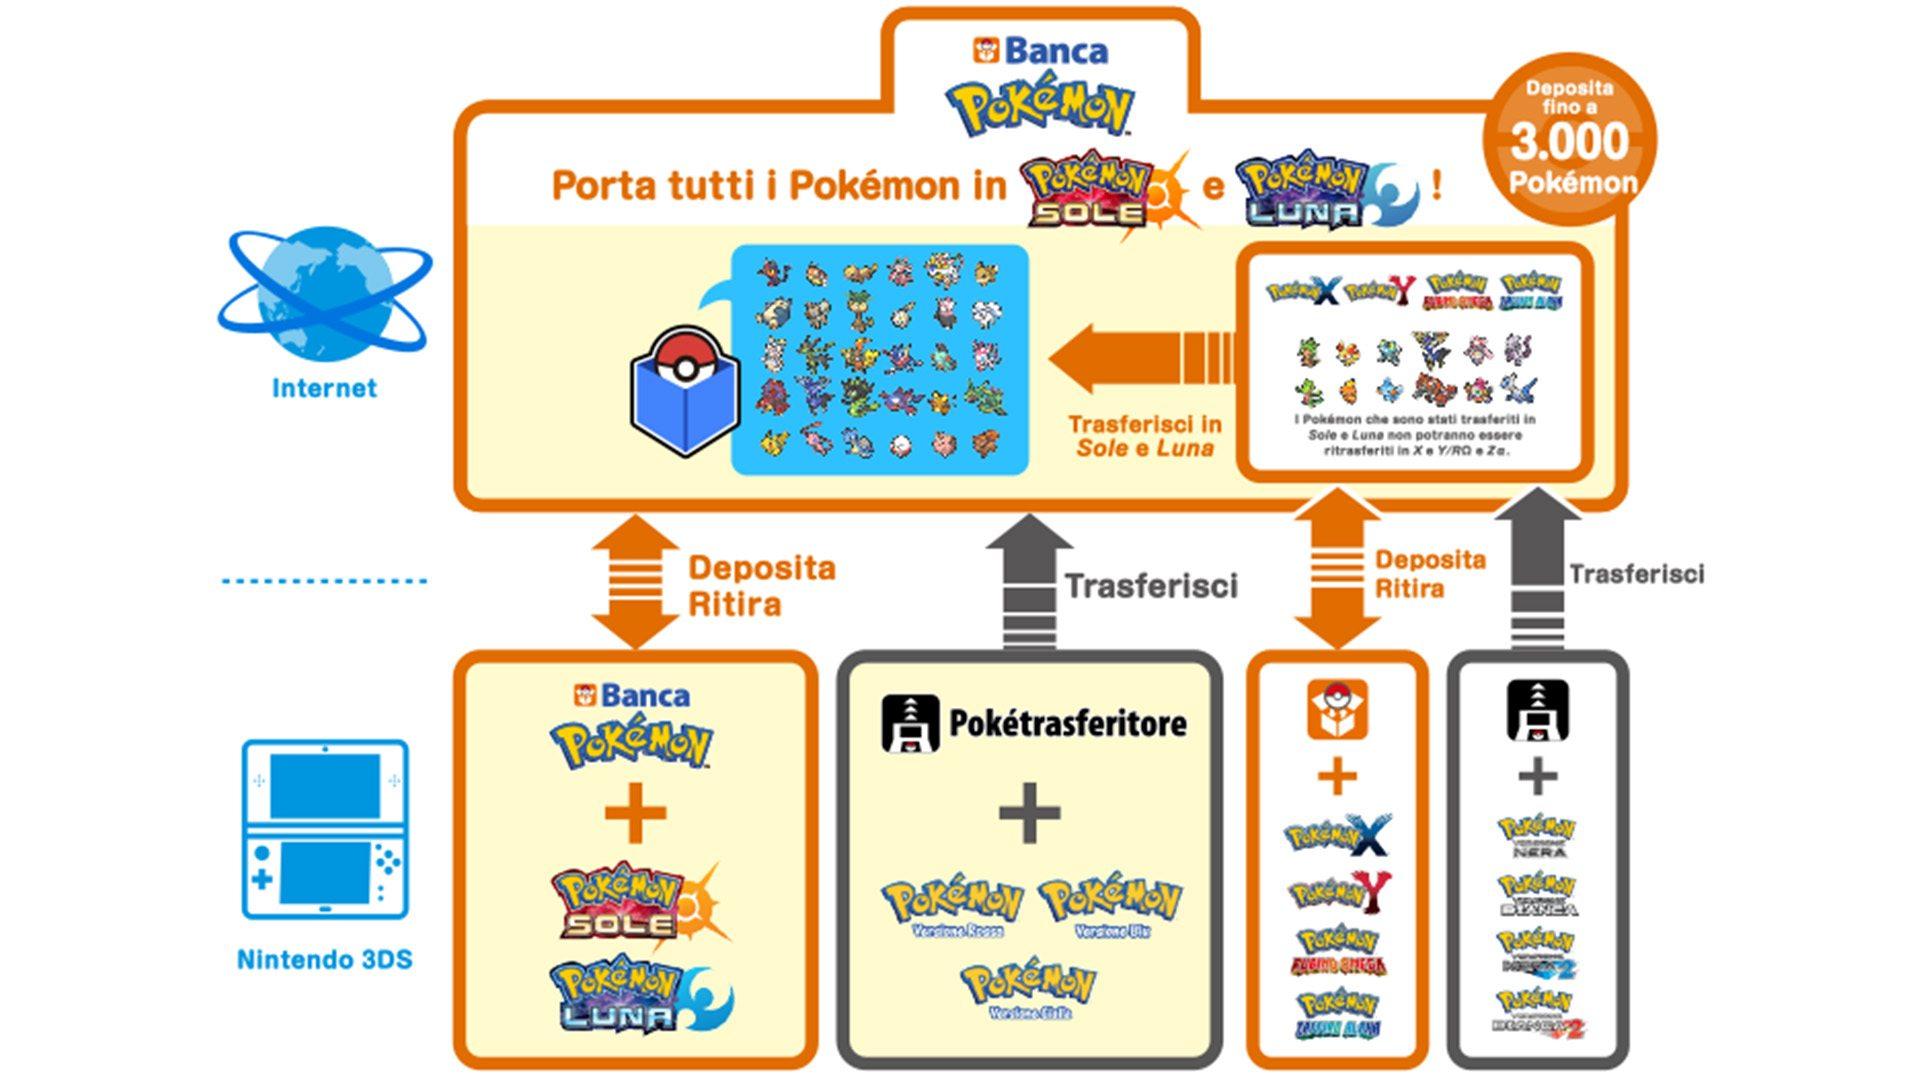 Banca Pokémon Pokémon Sole e Luna